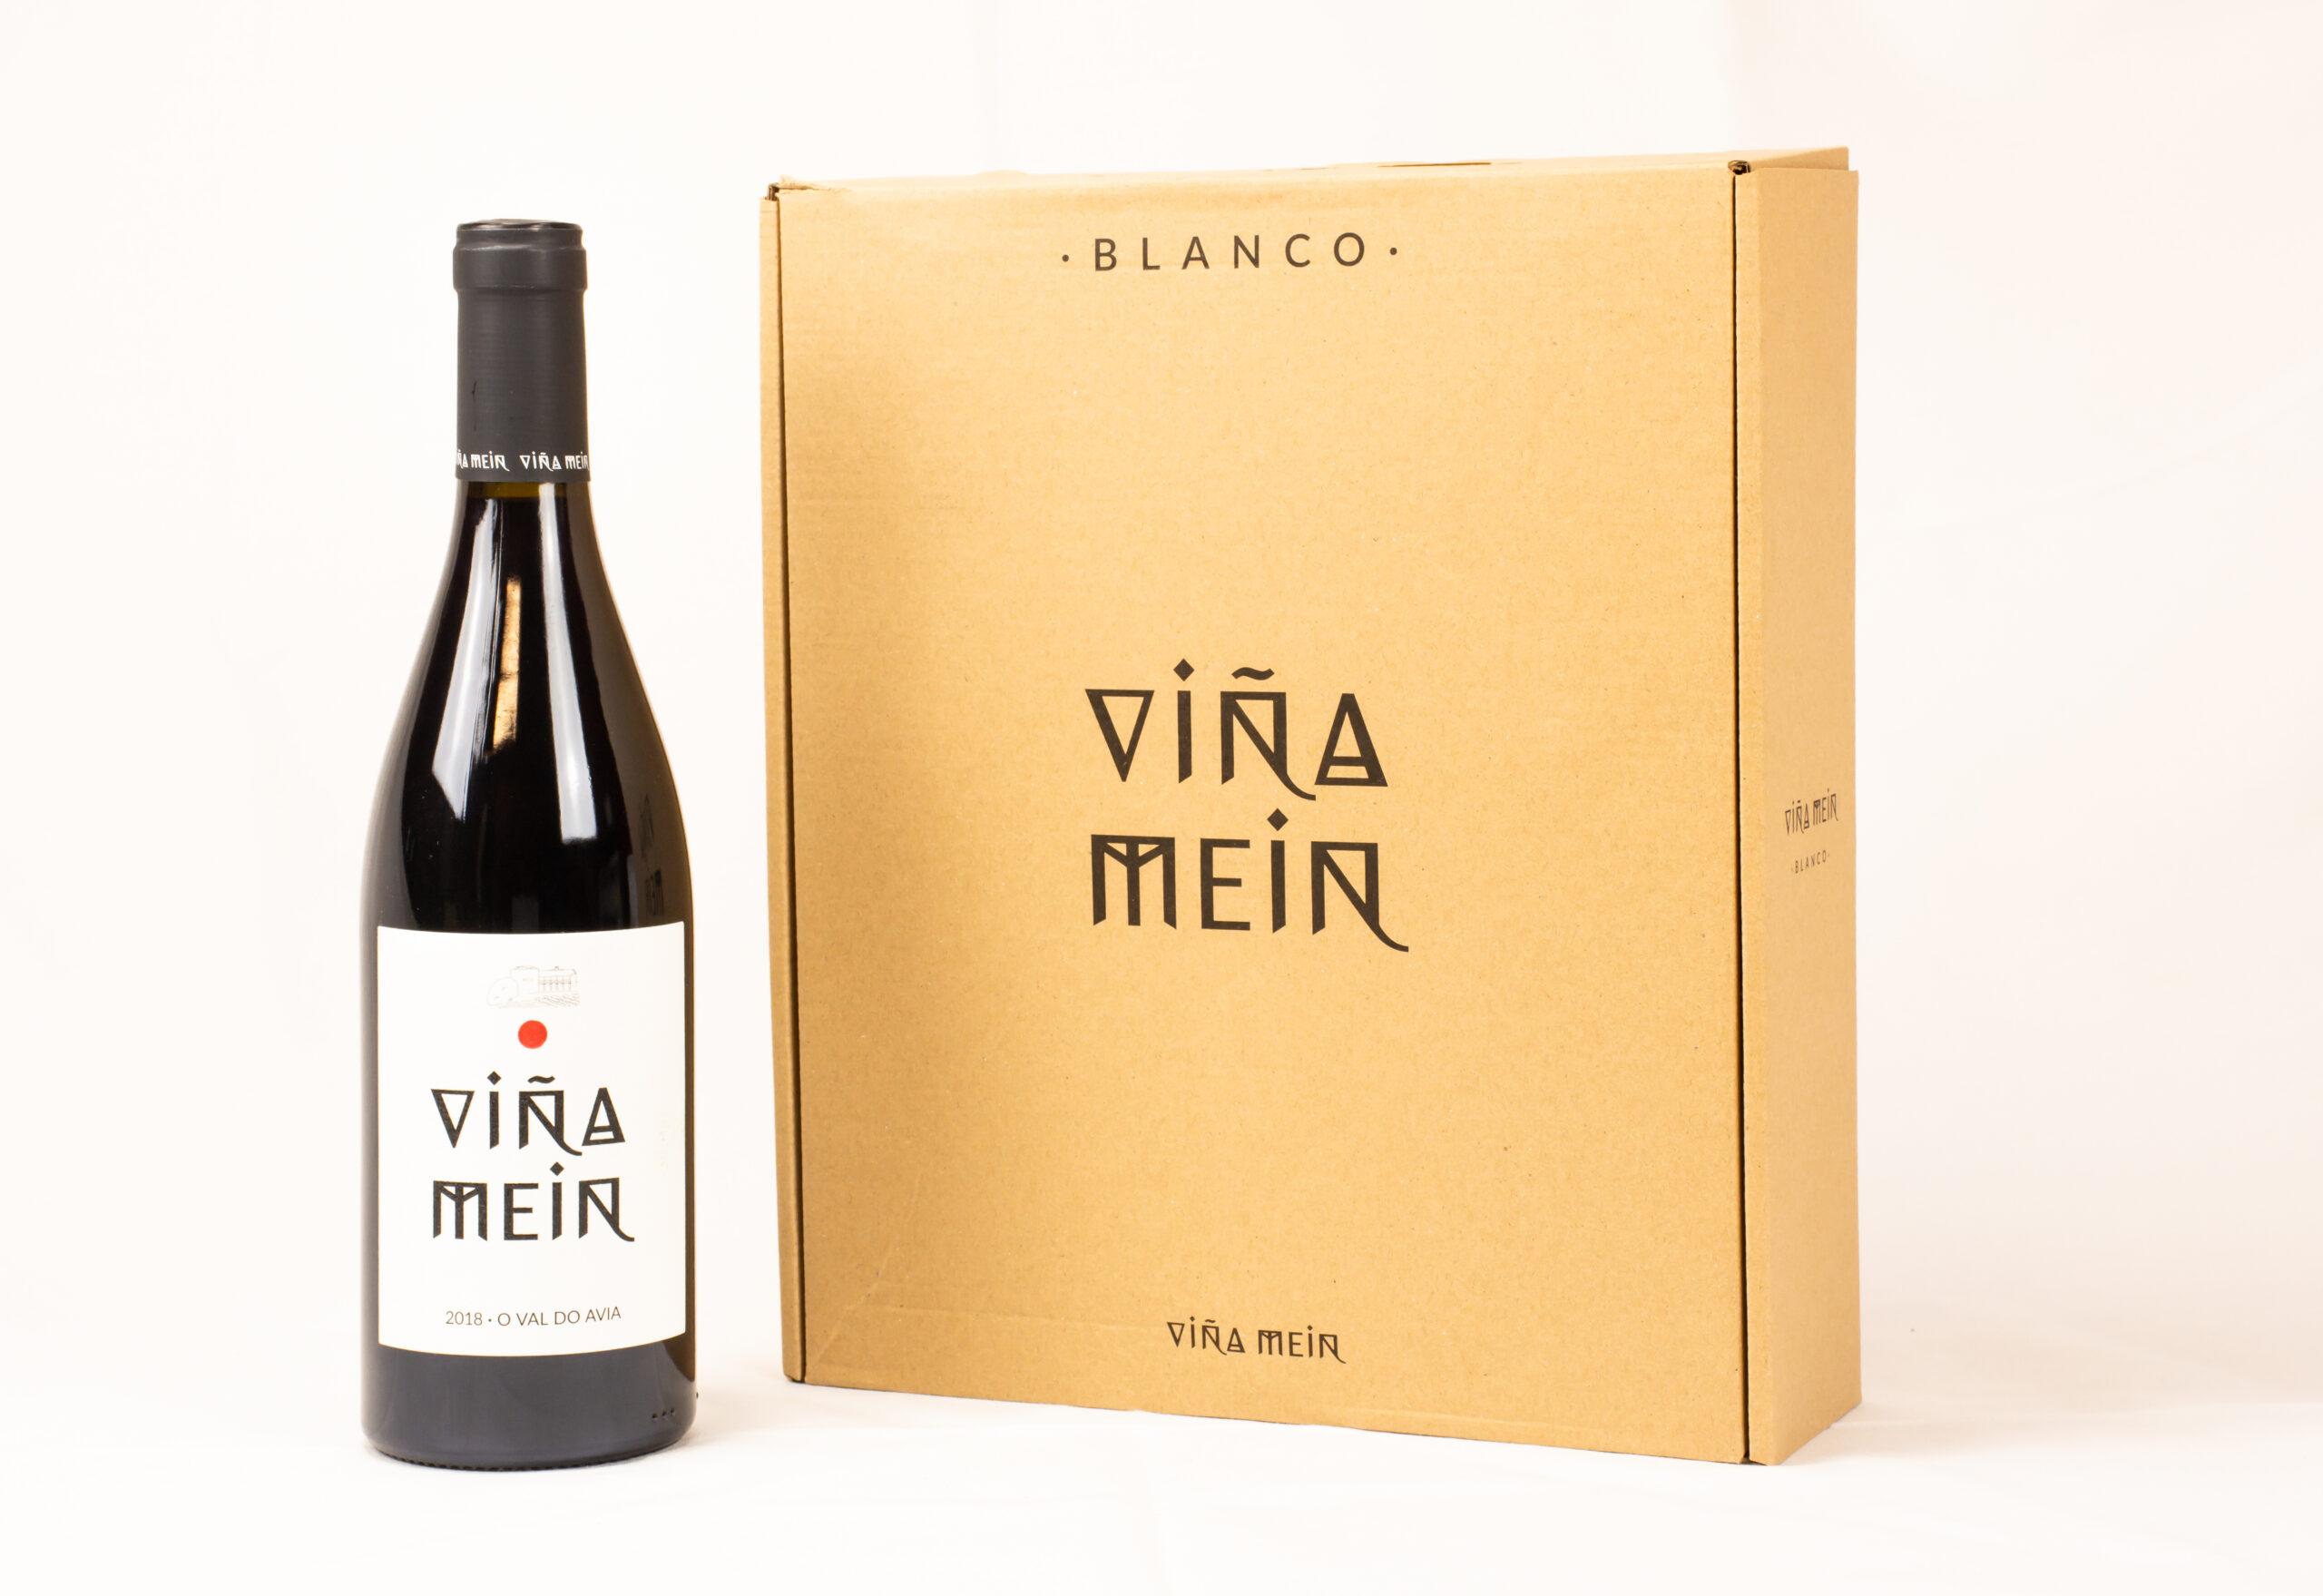 blanco-viña-mein